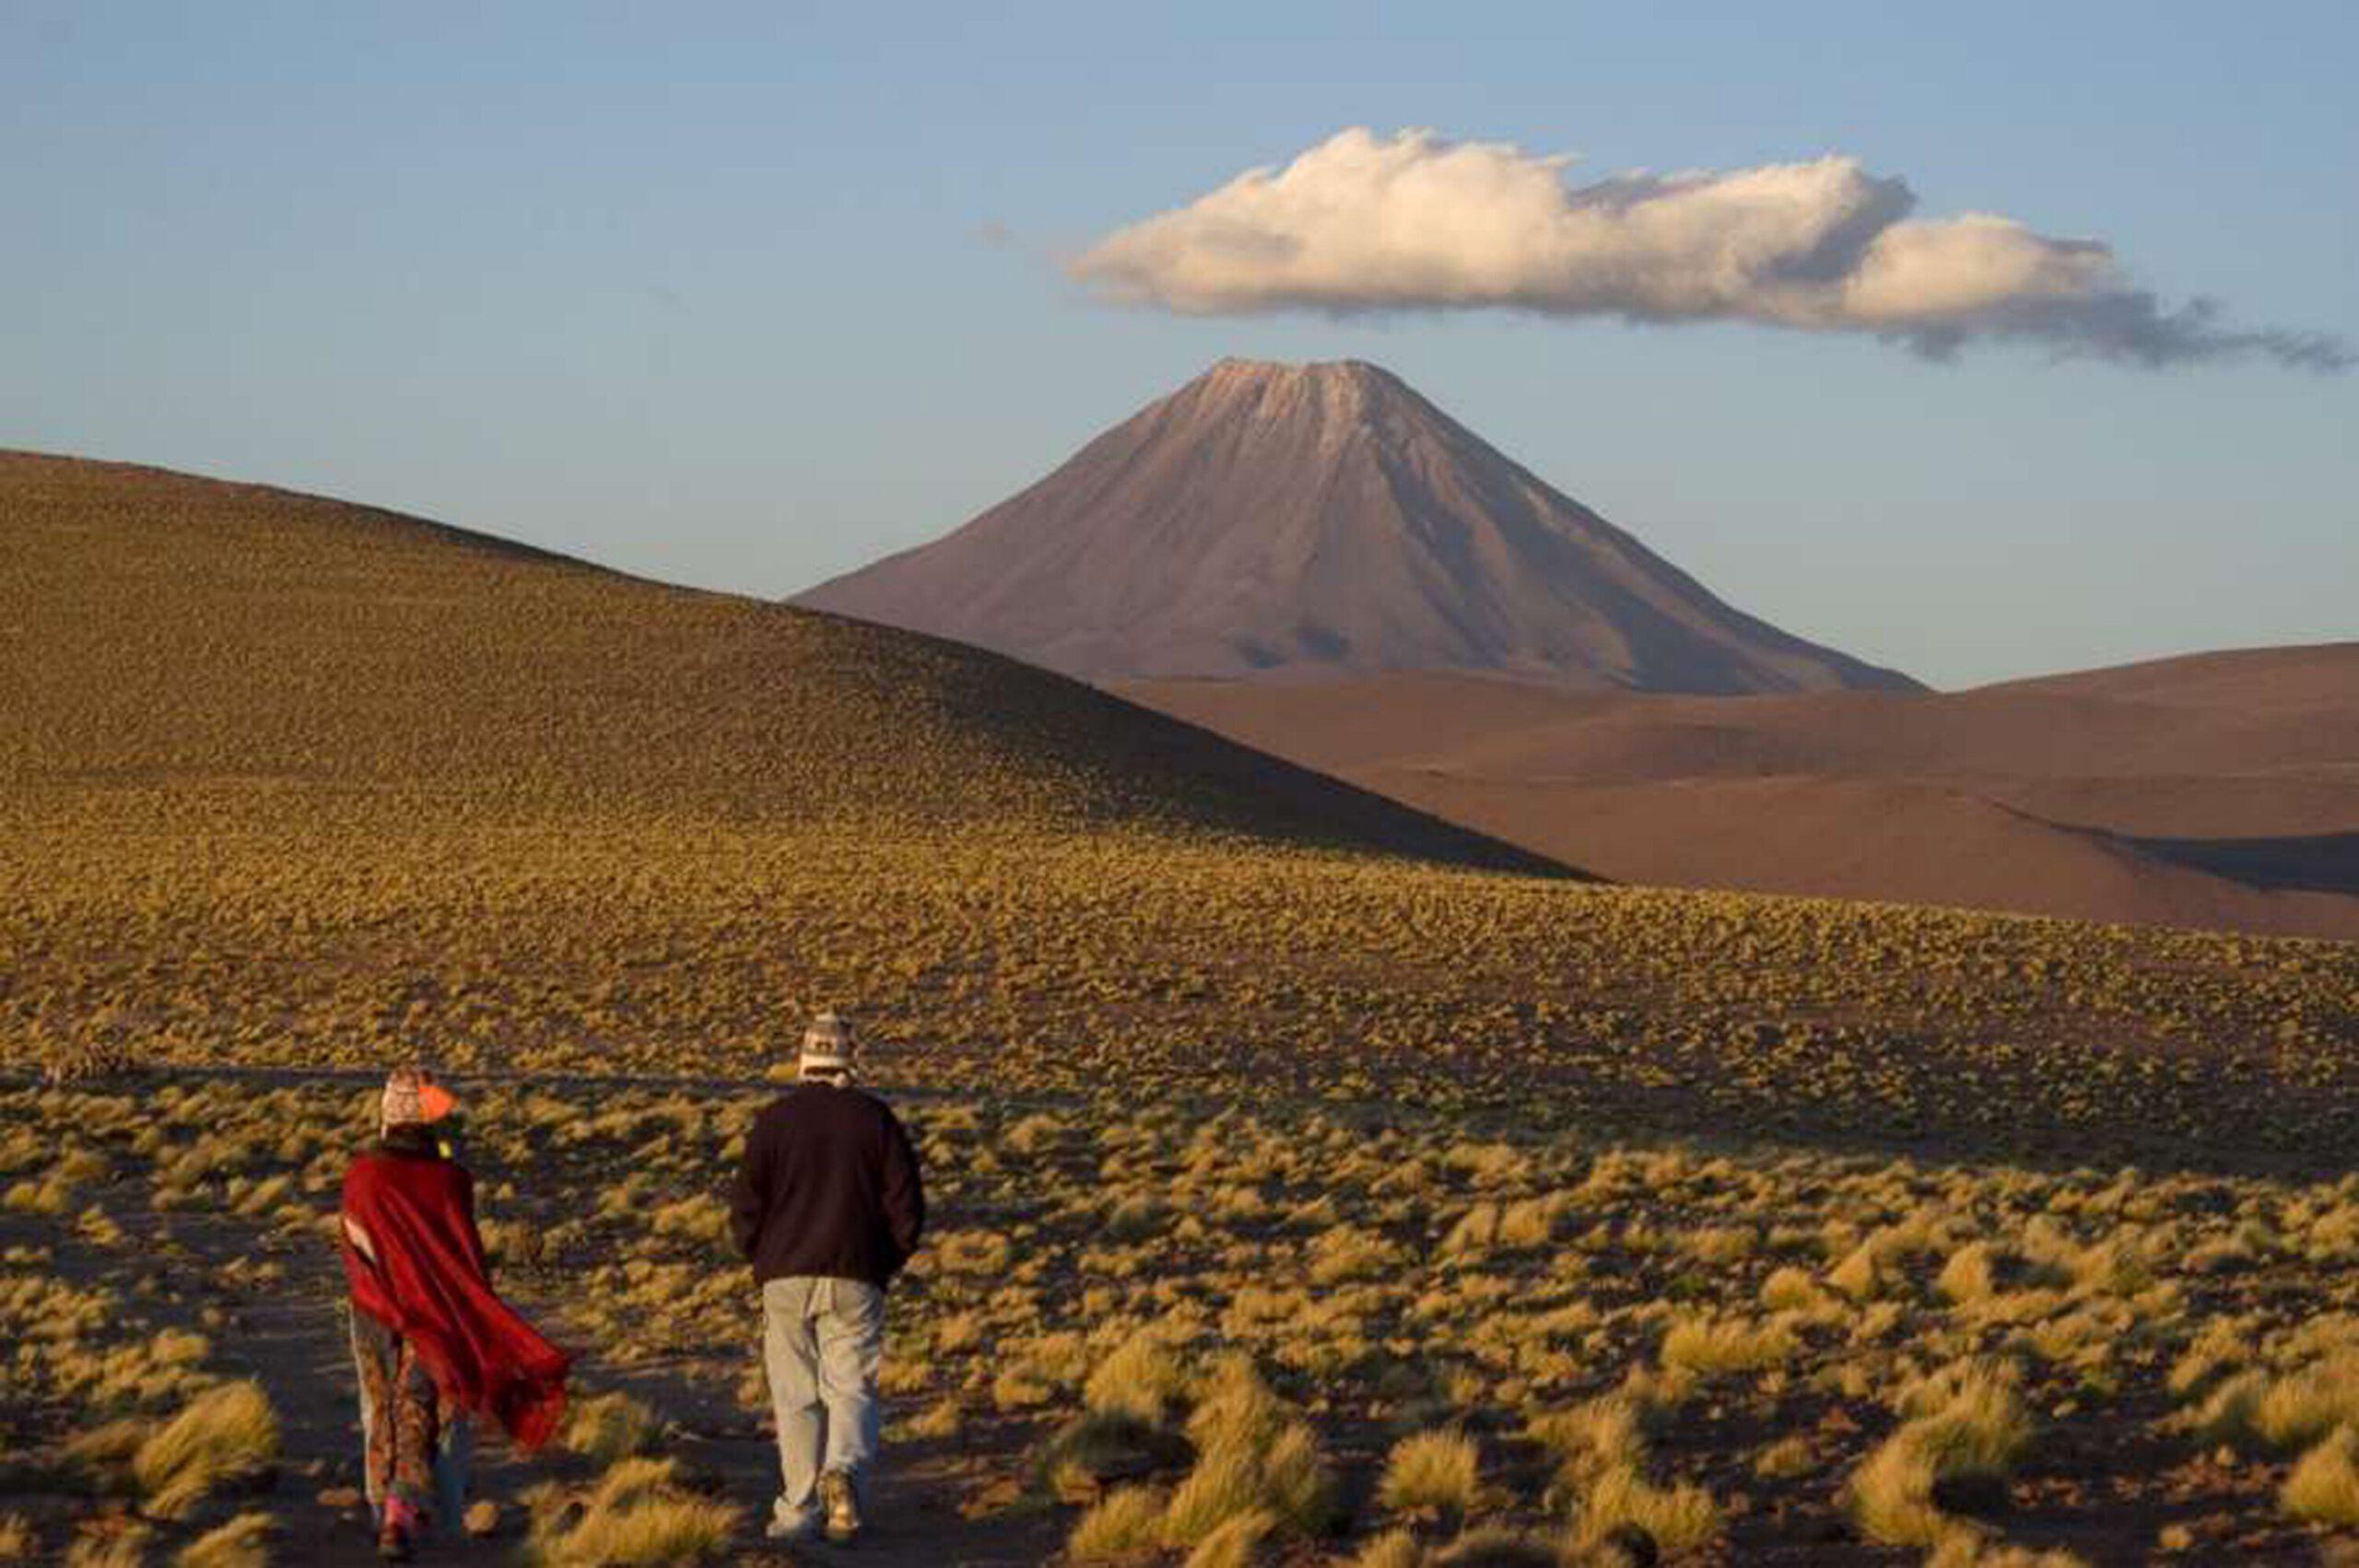 hiking through the Atacama desert looking at a mountain